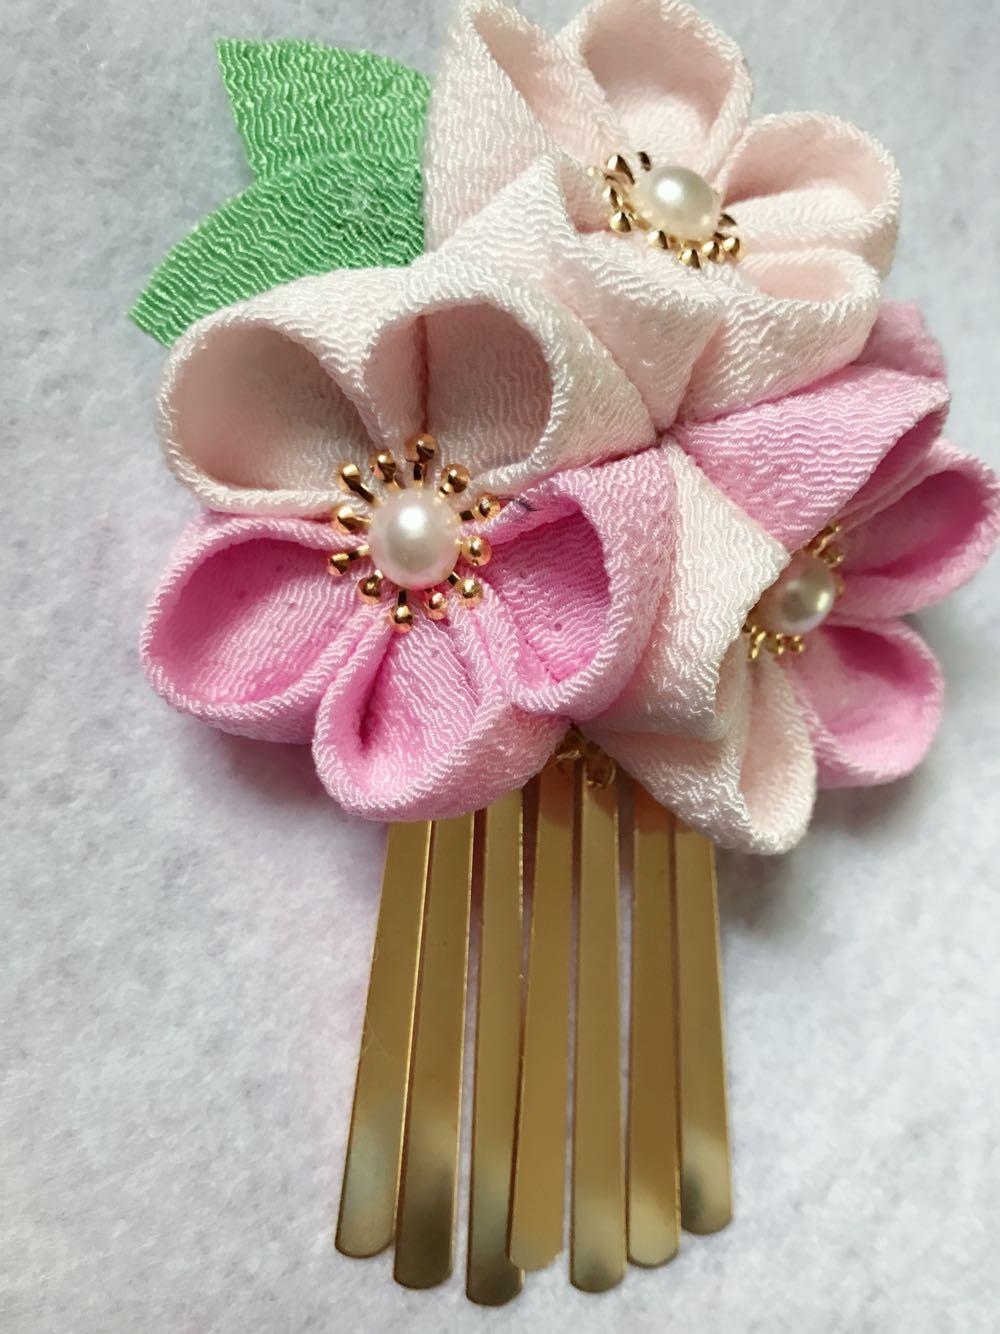 Japanese hair ornaments - Japanese Style Hairpin Hand Made Kimono Hair Accessories Cotton Cloth Flower Tassels Hair Clip Lovely Headwear